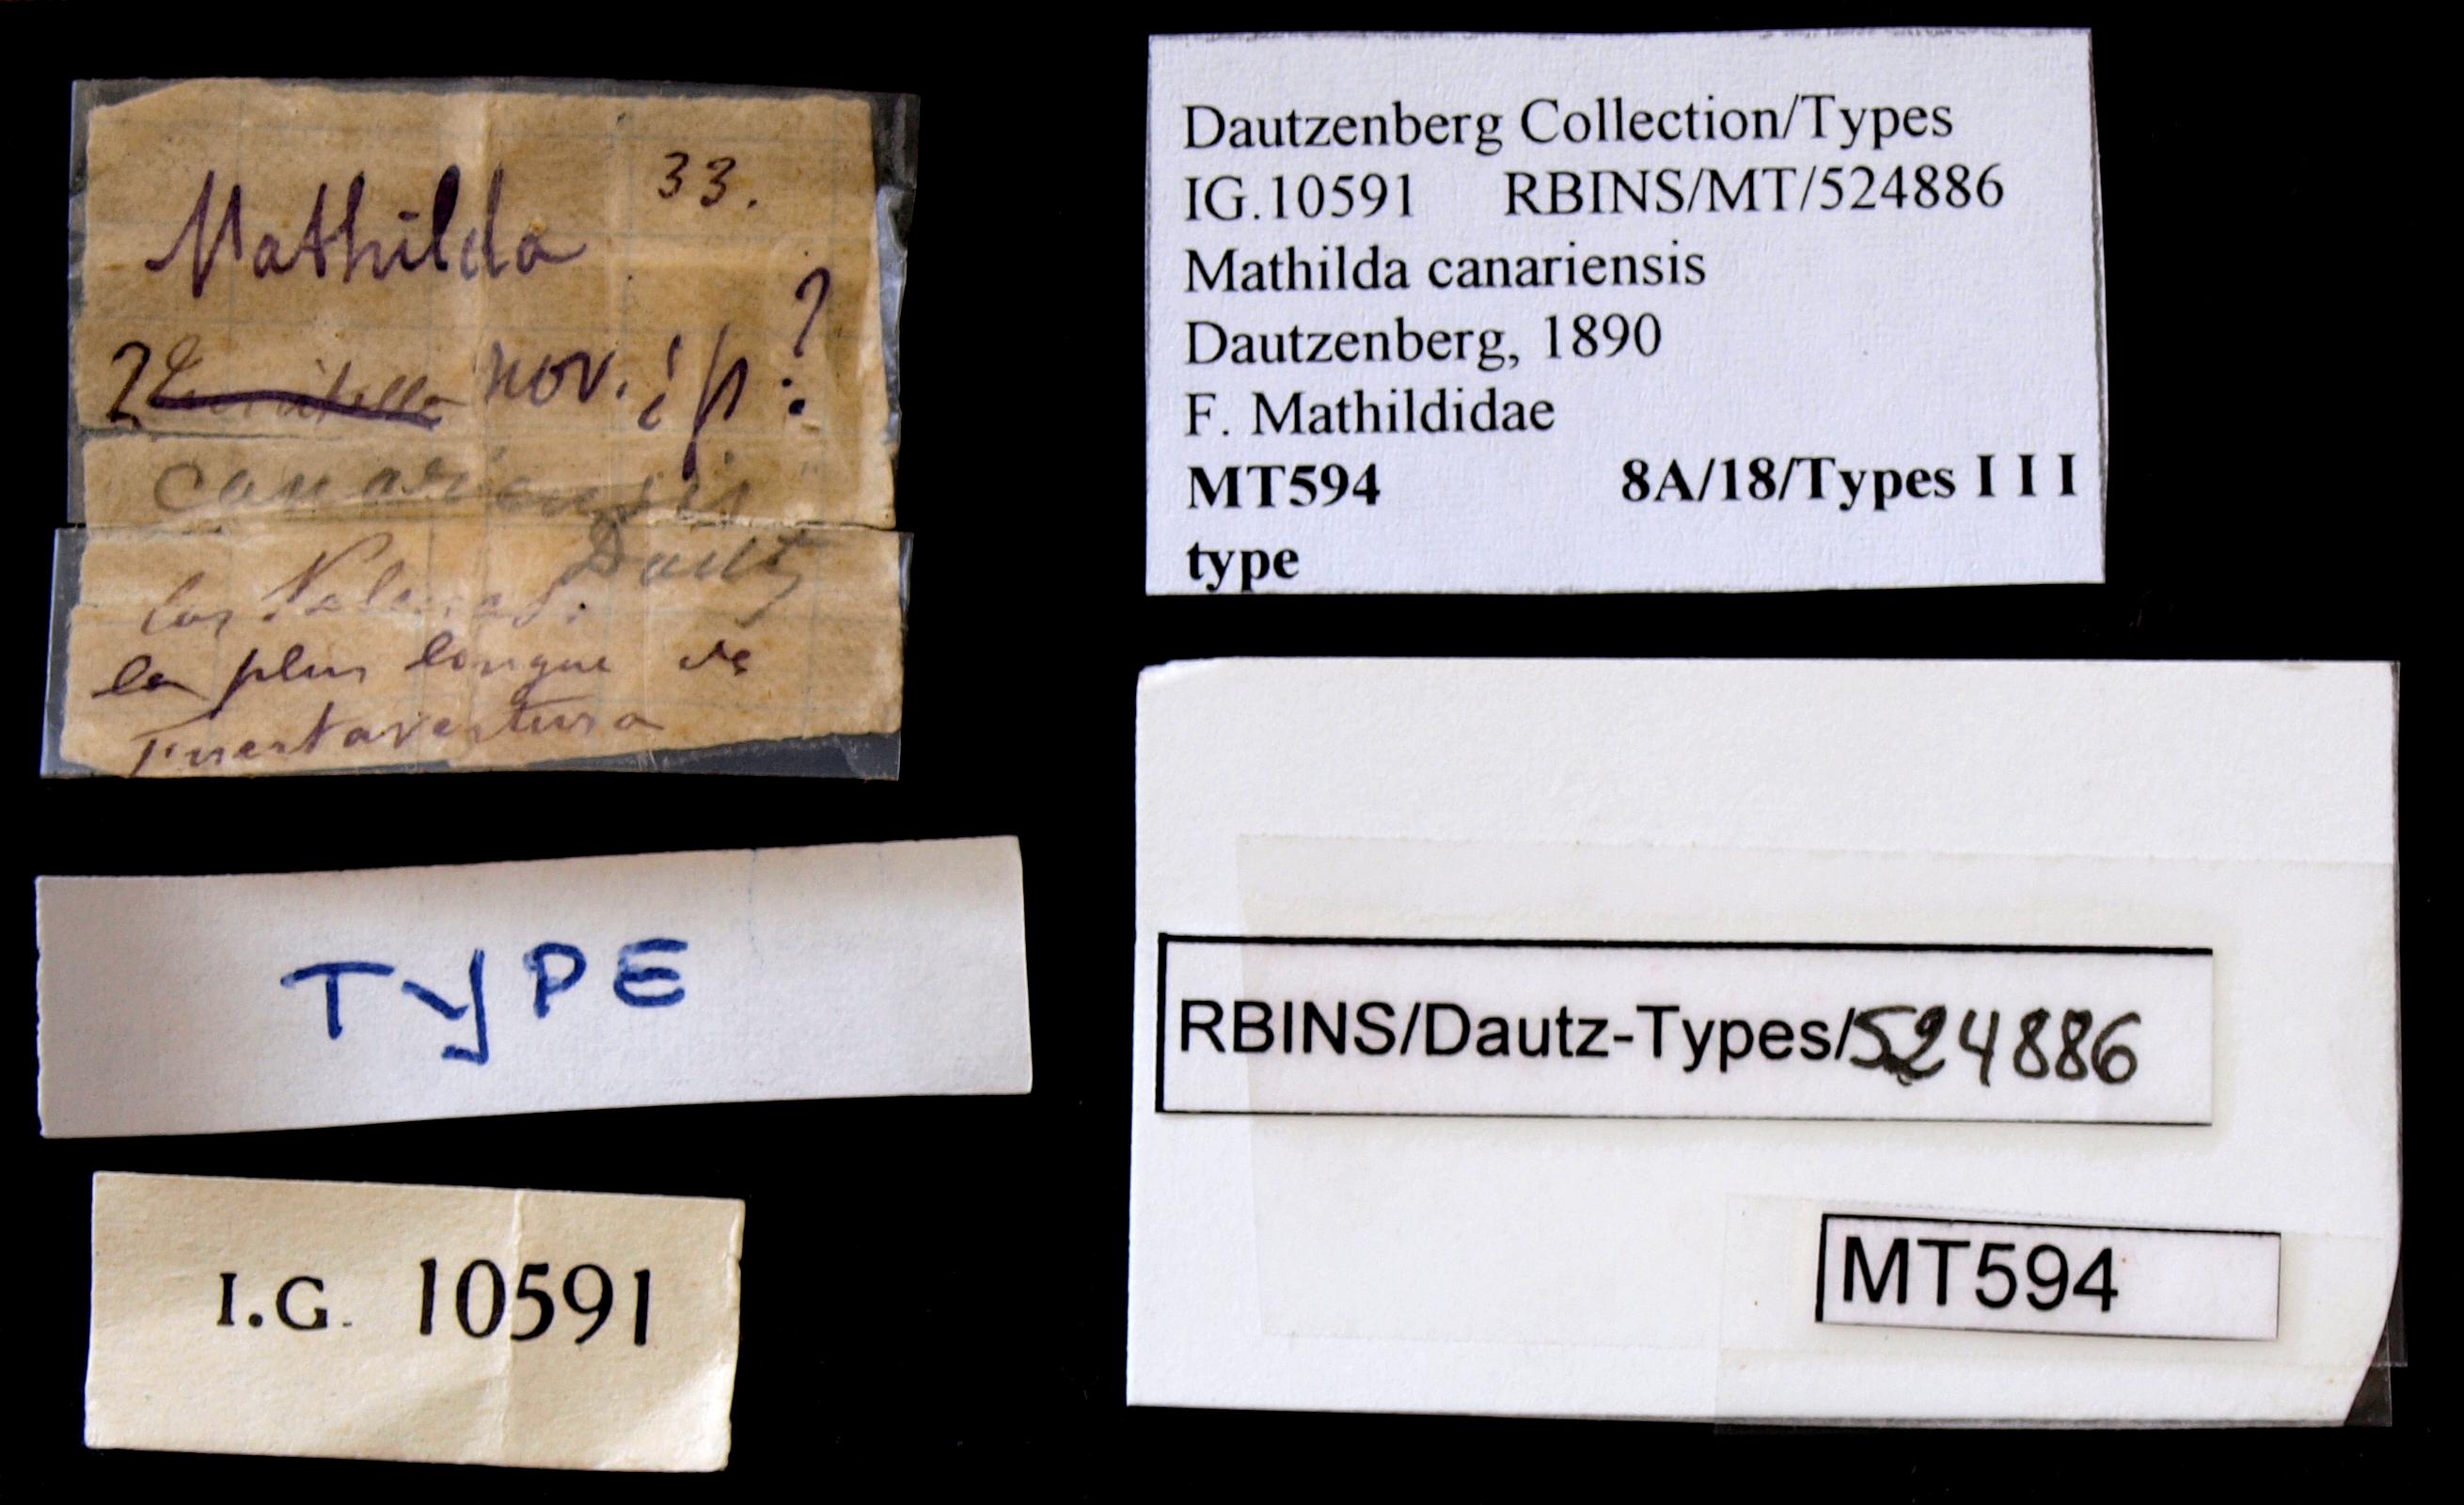 BE-RBINS-INV TYPE MT 594 Mathilda canariensis LABELS.jpg